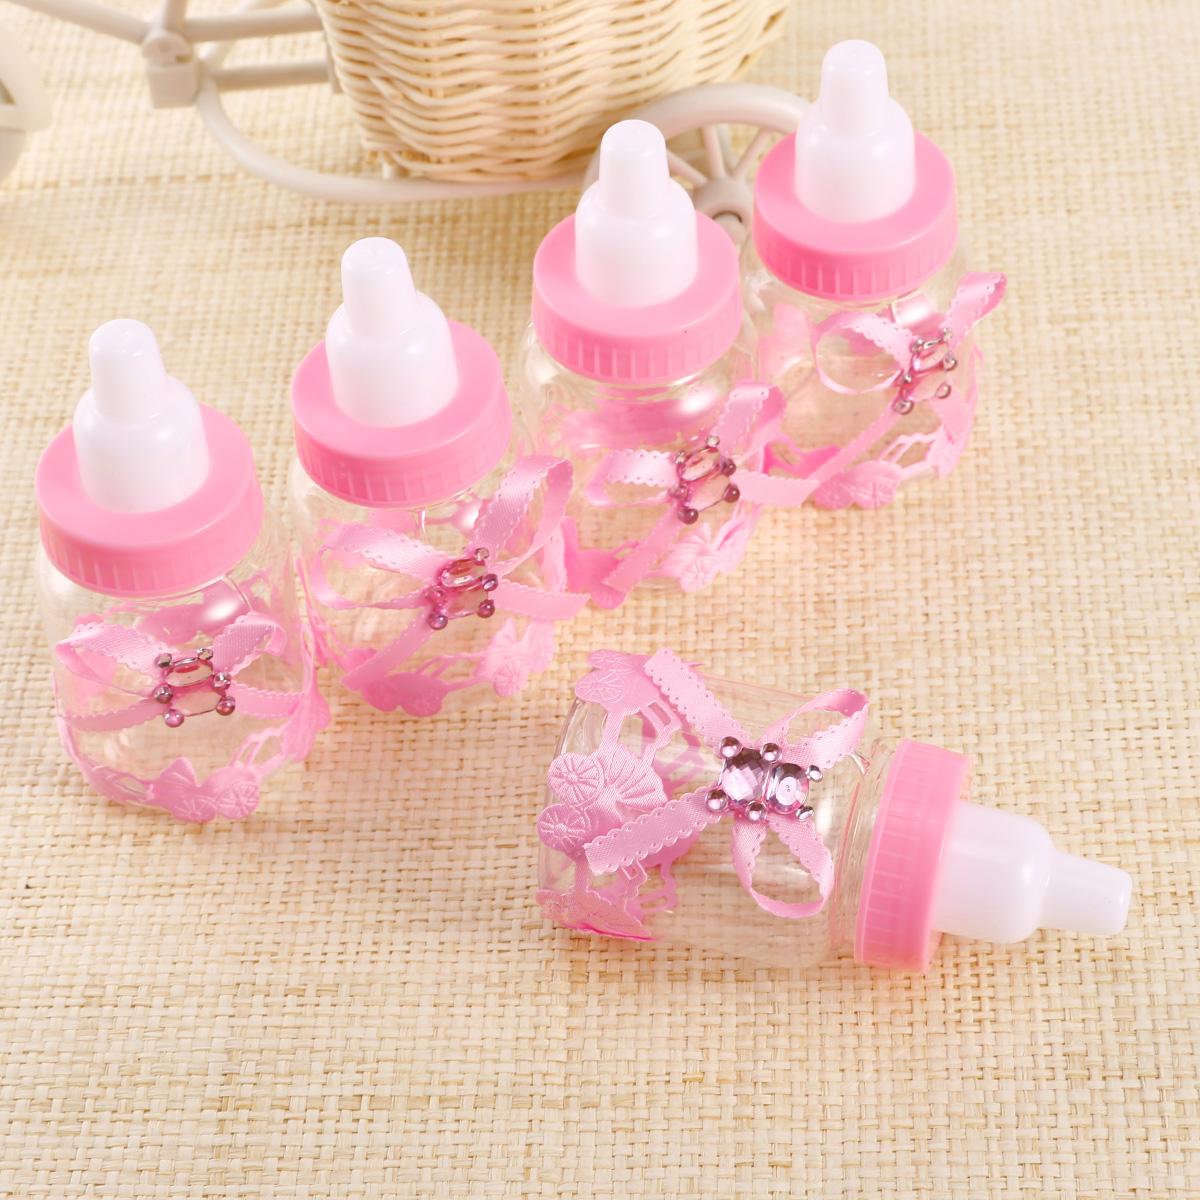 pcs cute baby candy bottles blue pink lids lollies baby shower ebay